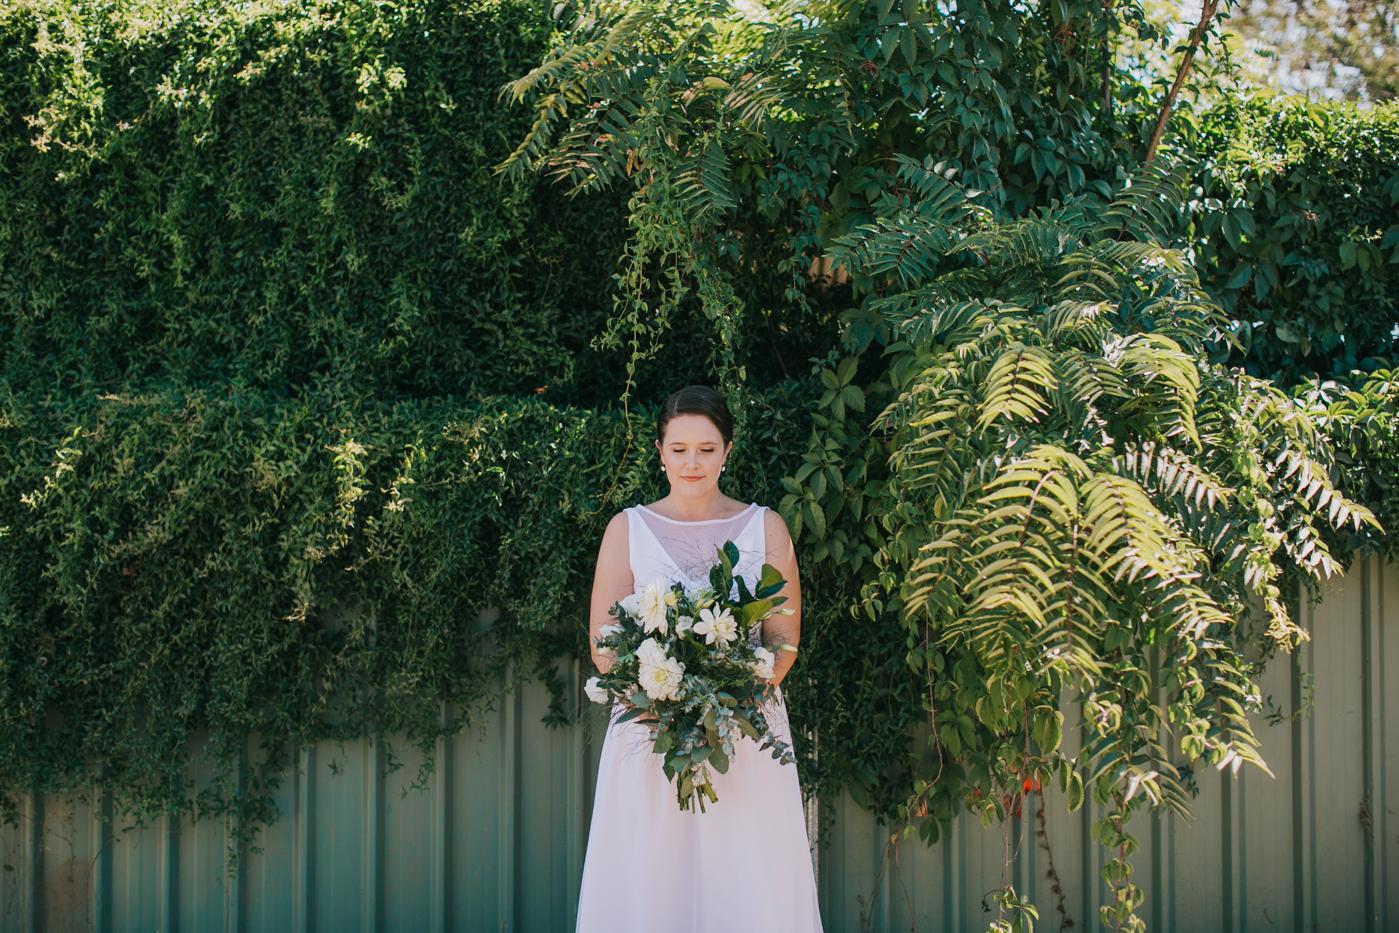 Nicolle & Jacob - Dubbo Wedding - Country Australia - Samantha Heather Photography-63.jpg